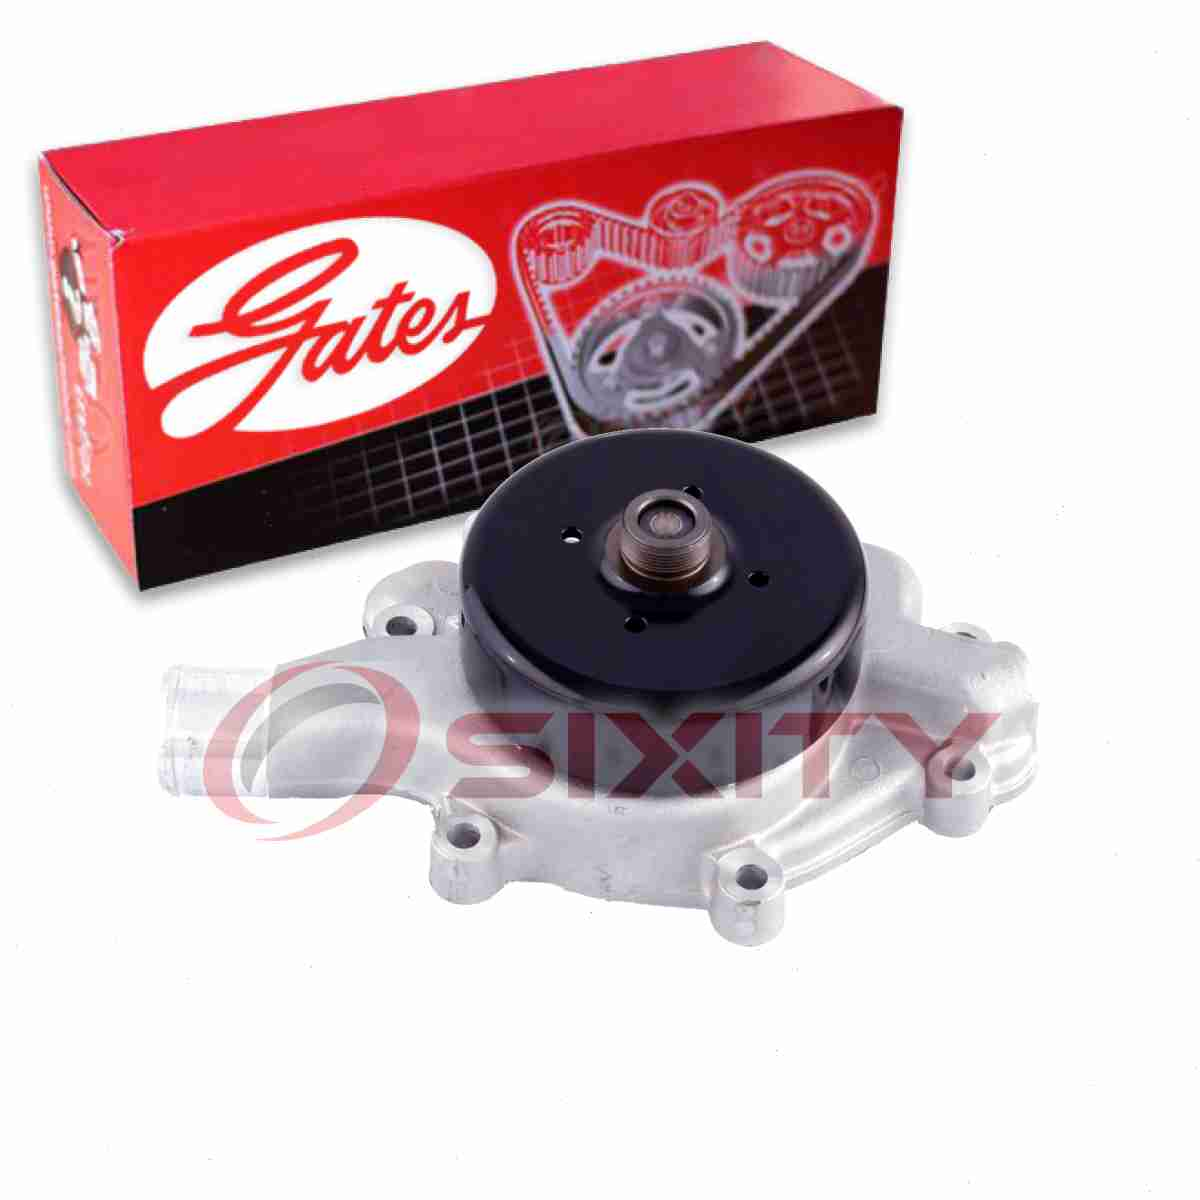 Gates Timing Belt Water Pump Kit for 2013-2015 Acura RDX 3.5L V6 Engine mf